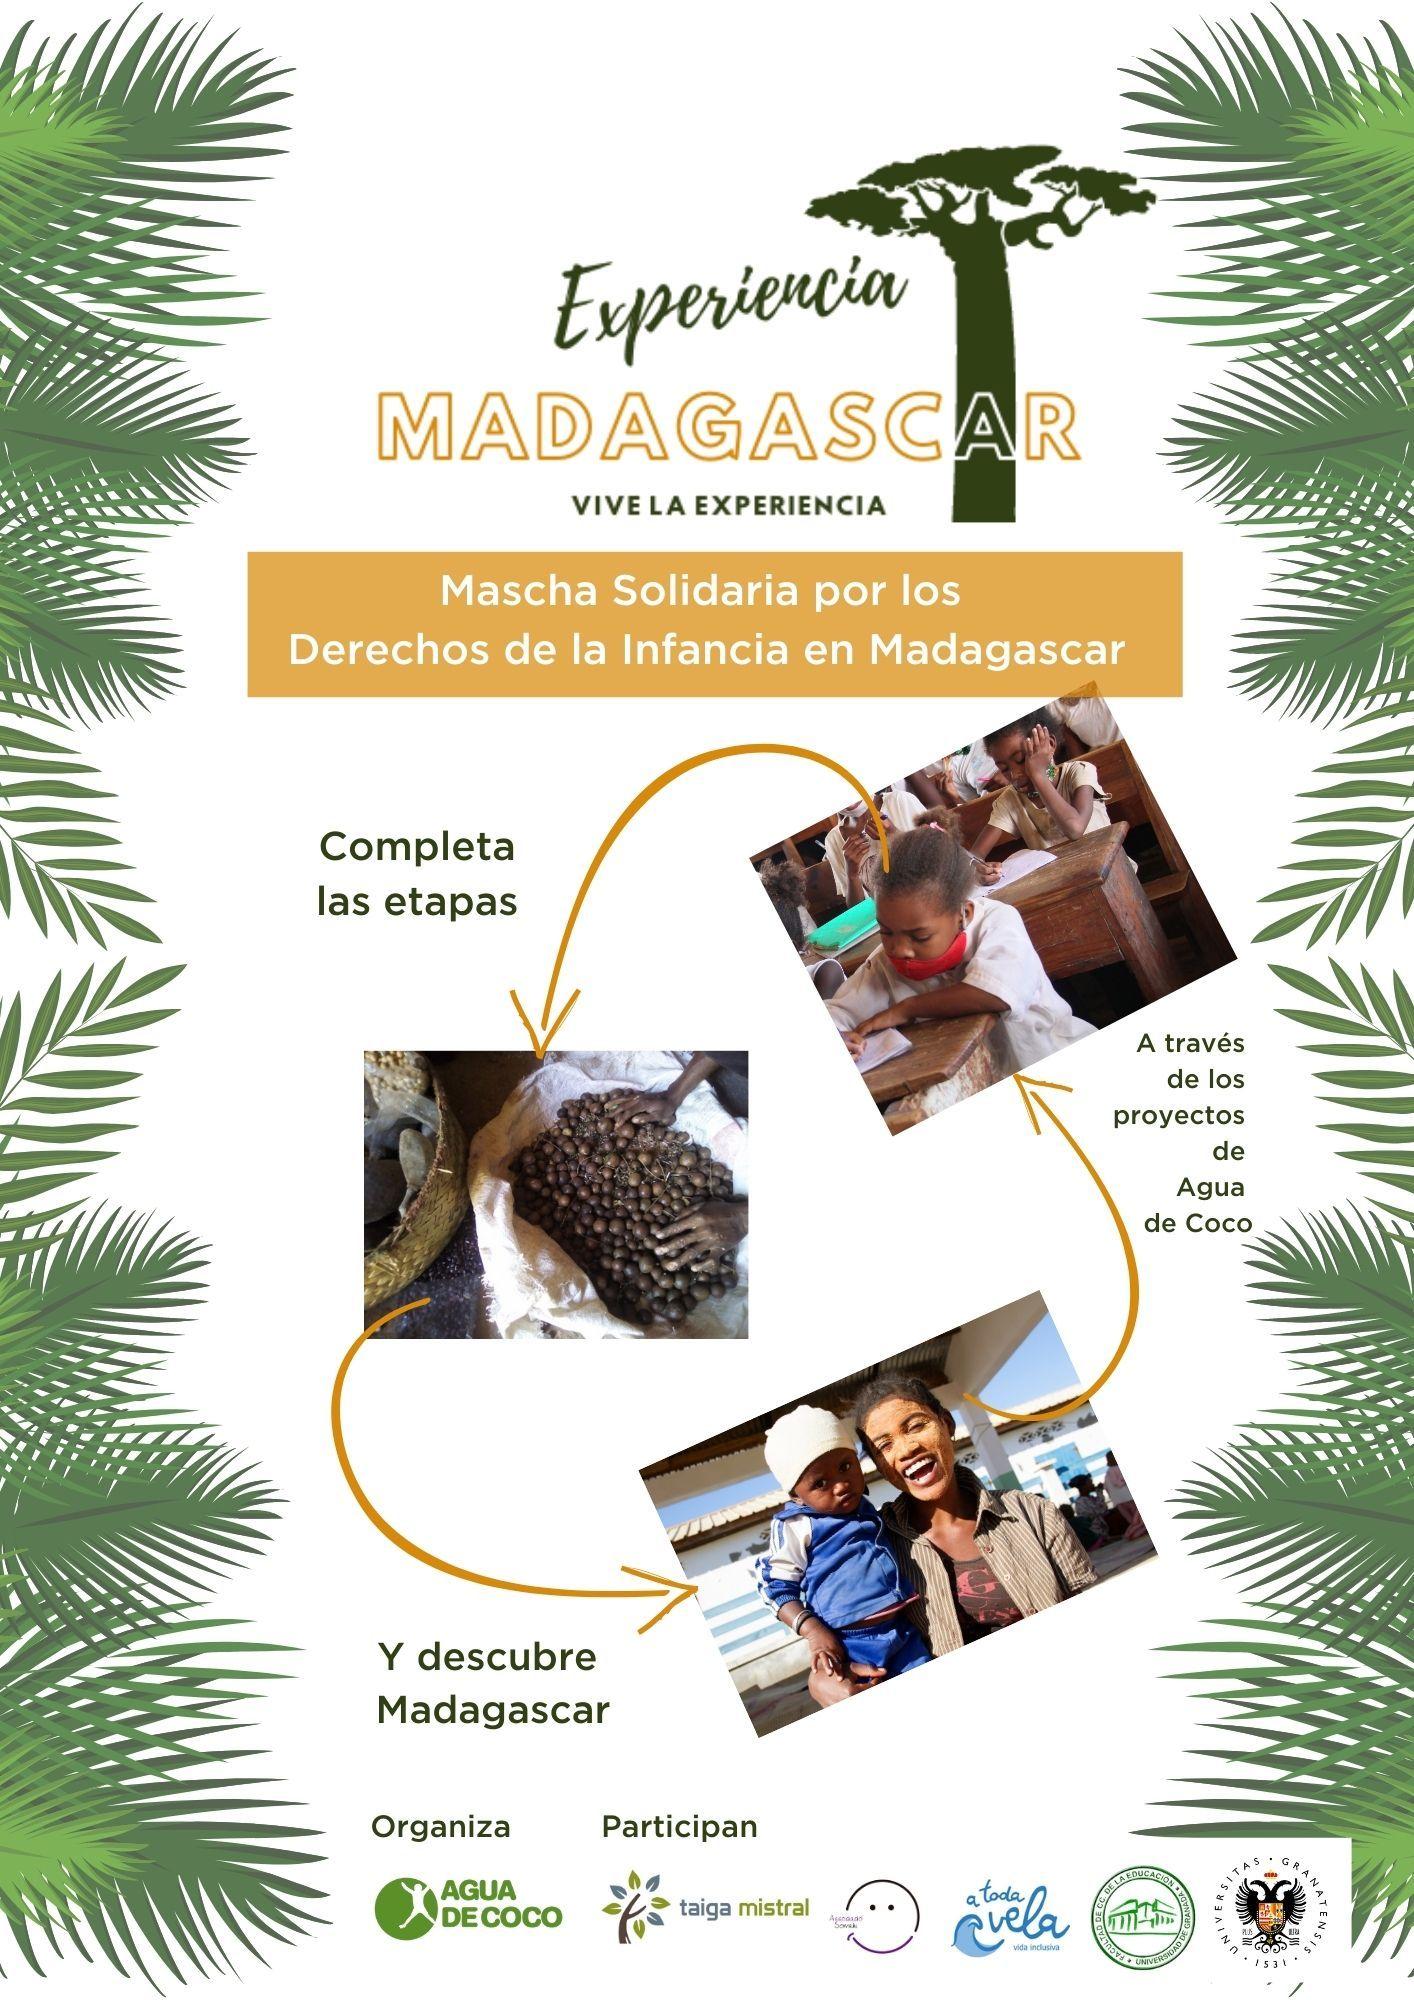 Experiencia Madagascar 2021